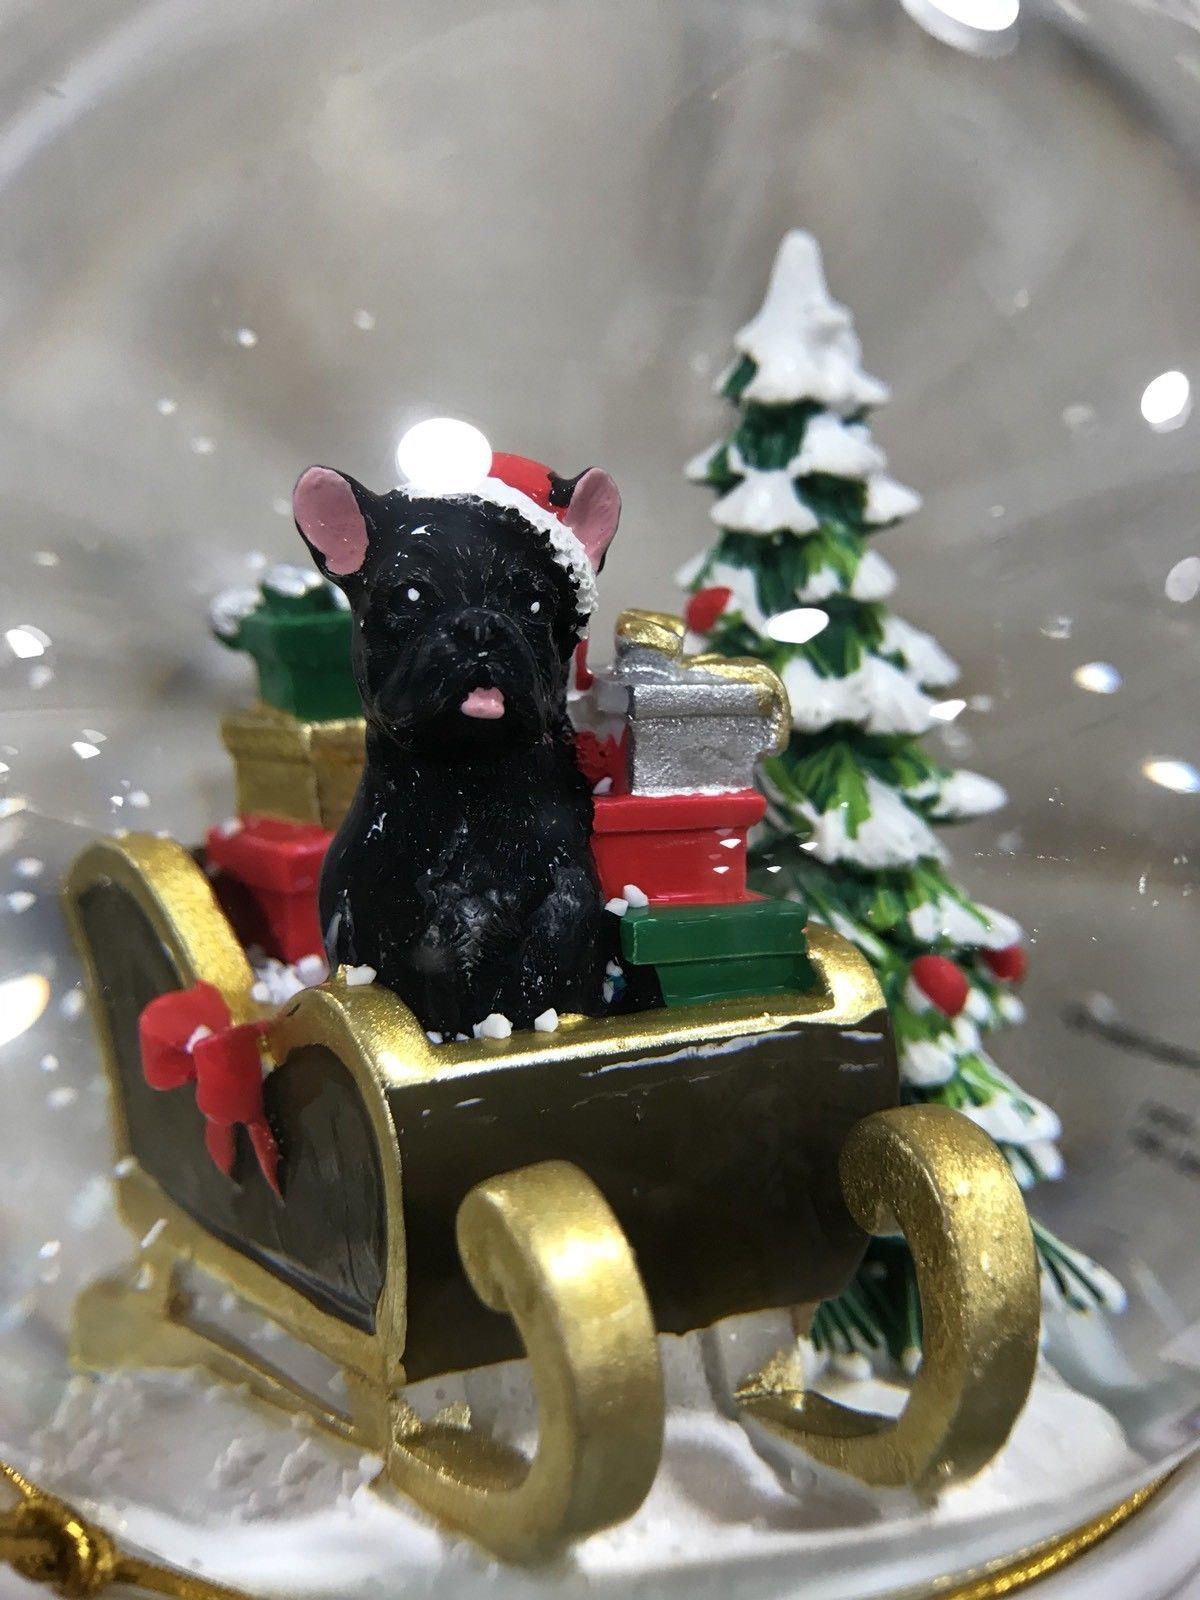 French Bulldog Christmas Ornament.French Bulldog Christmas Snow Globe Black Frenchie Holiday